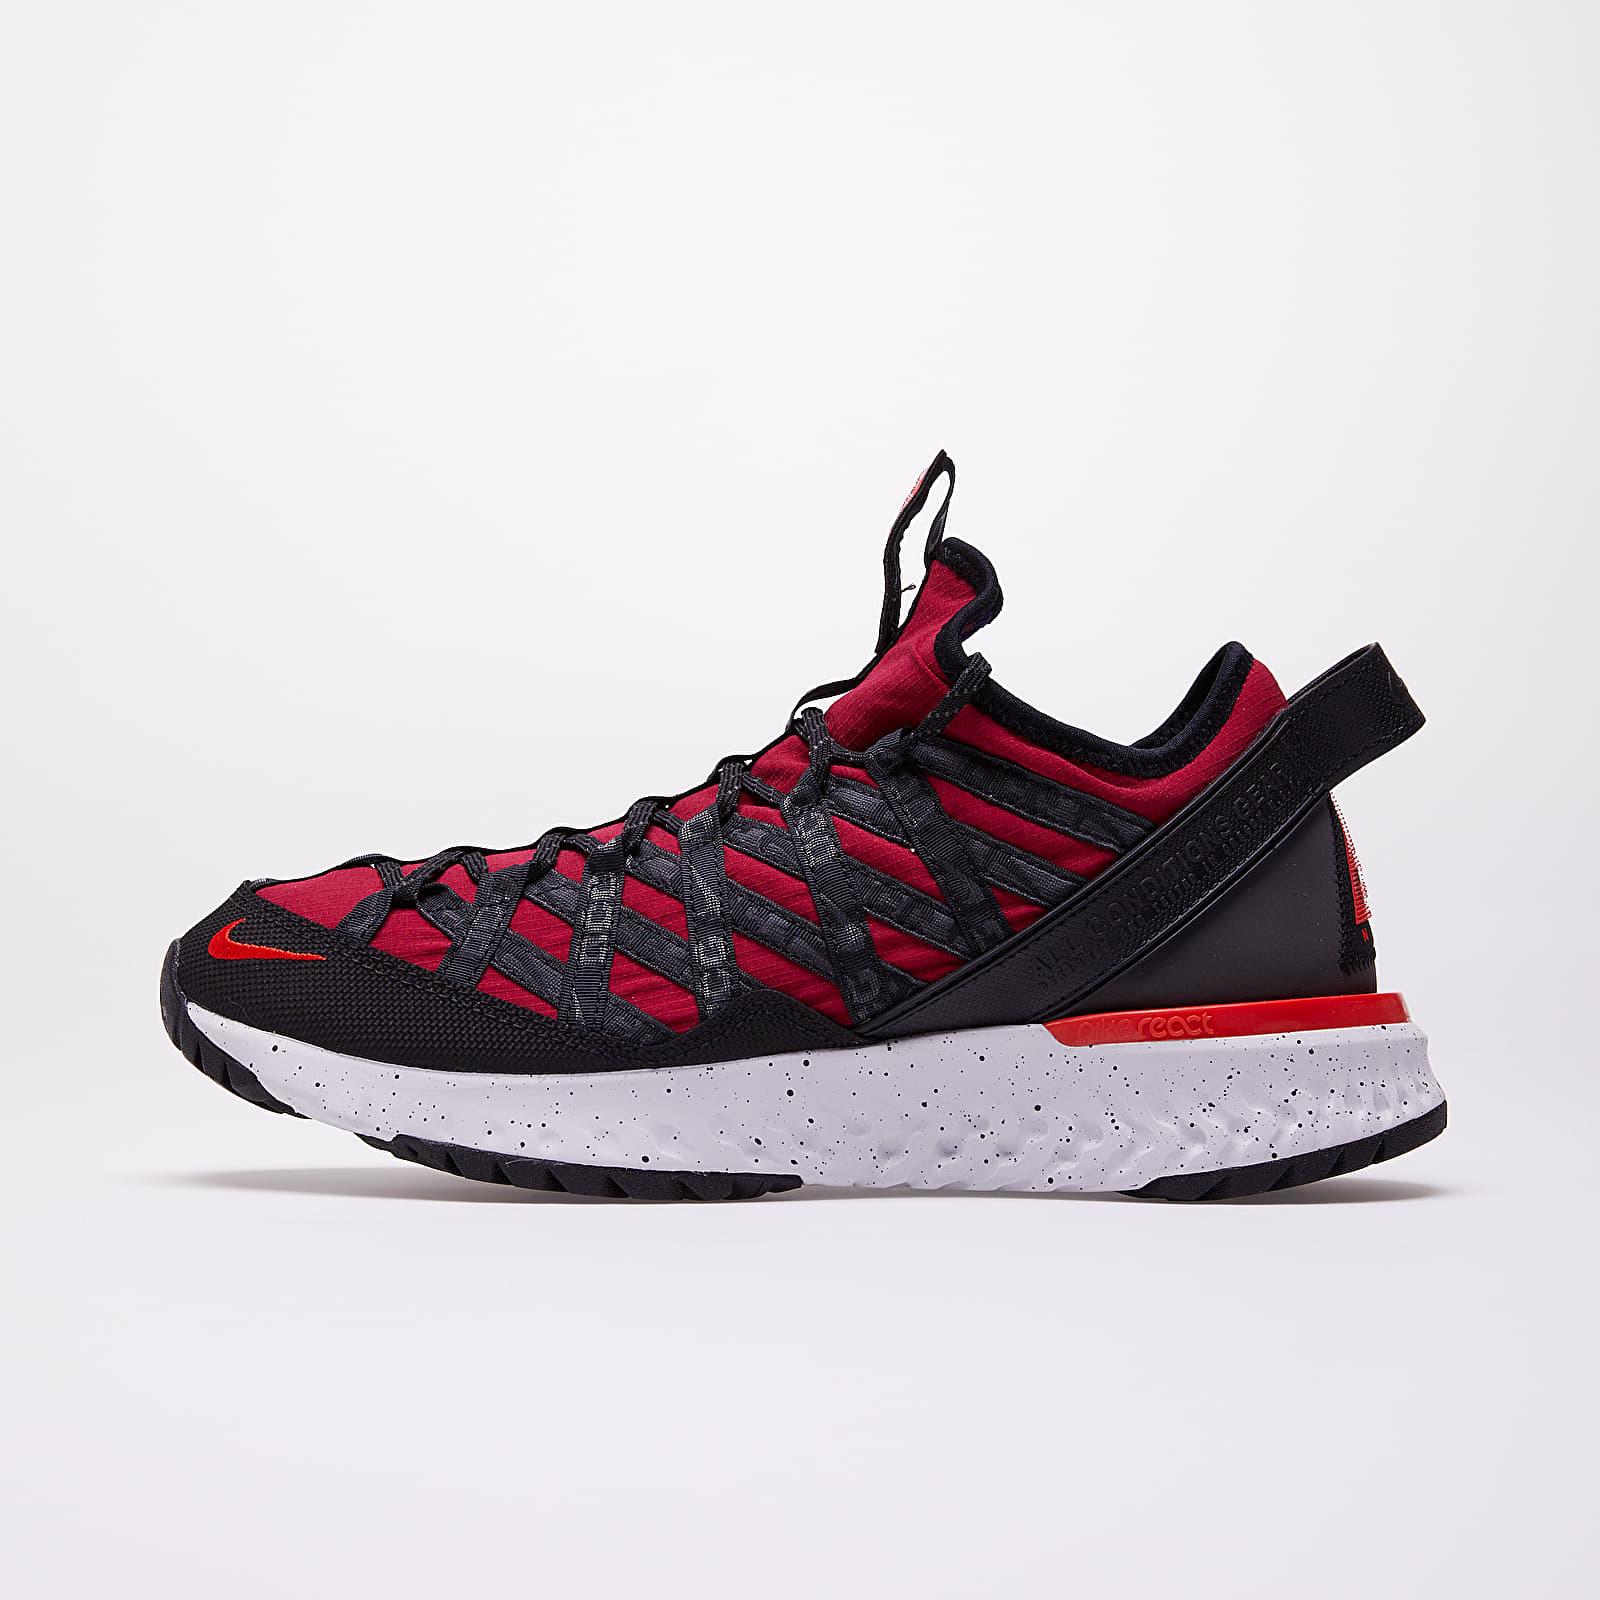 Pánske tenisky a topánky Nike ACG React Terra Gobe Noble Red/ Habanero Red-Court Purple